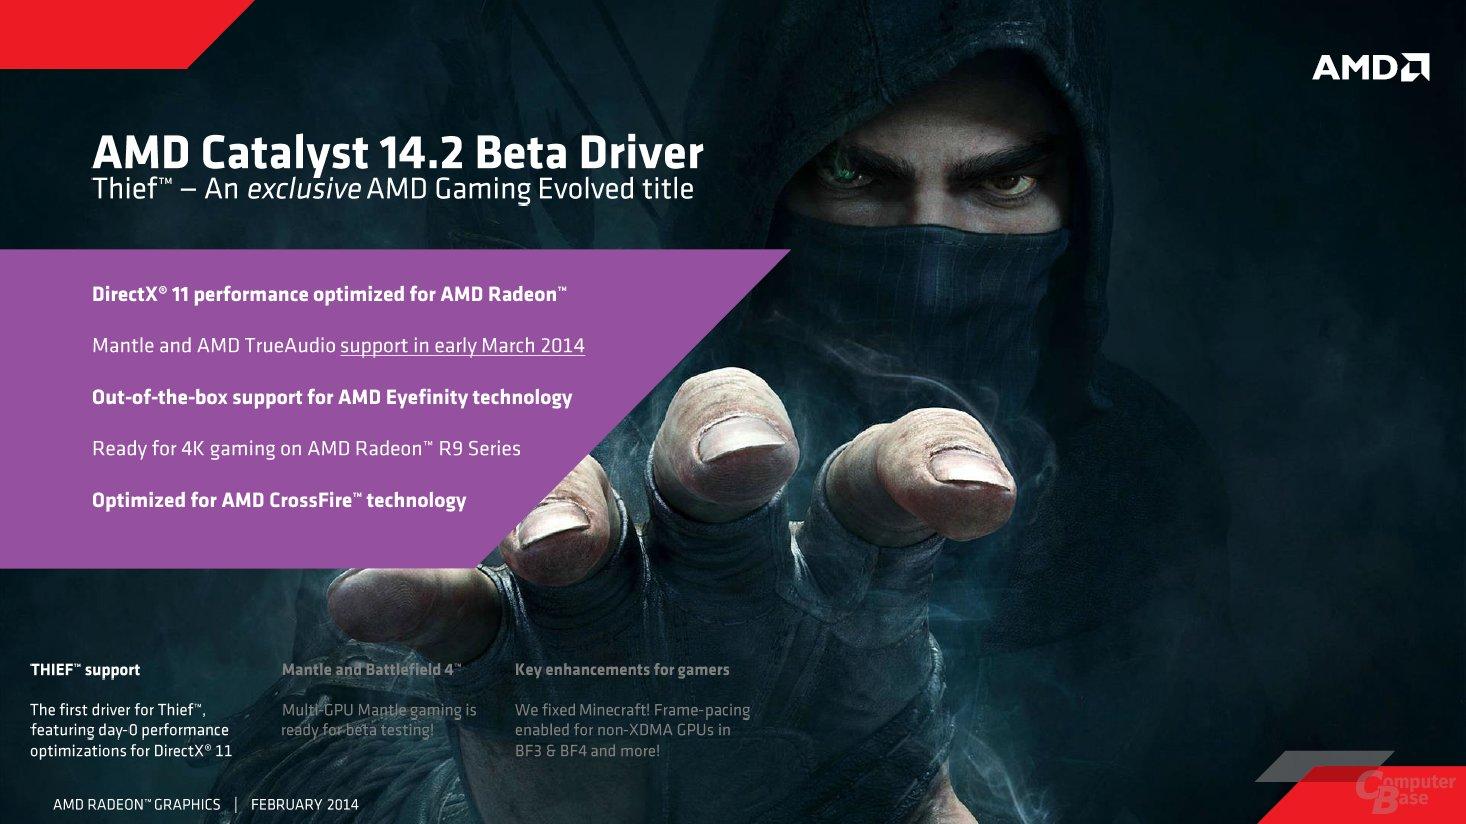 AMD Catalyst 14.2 Beta